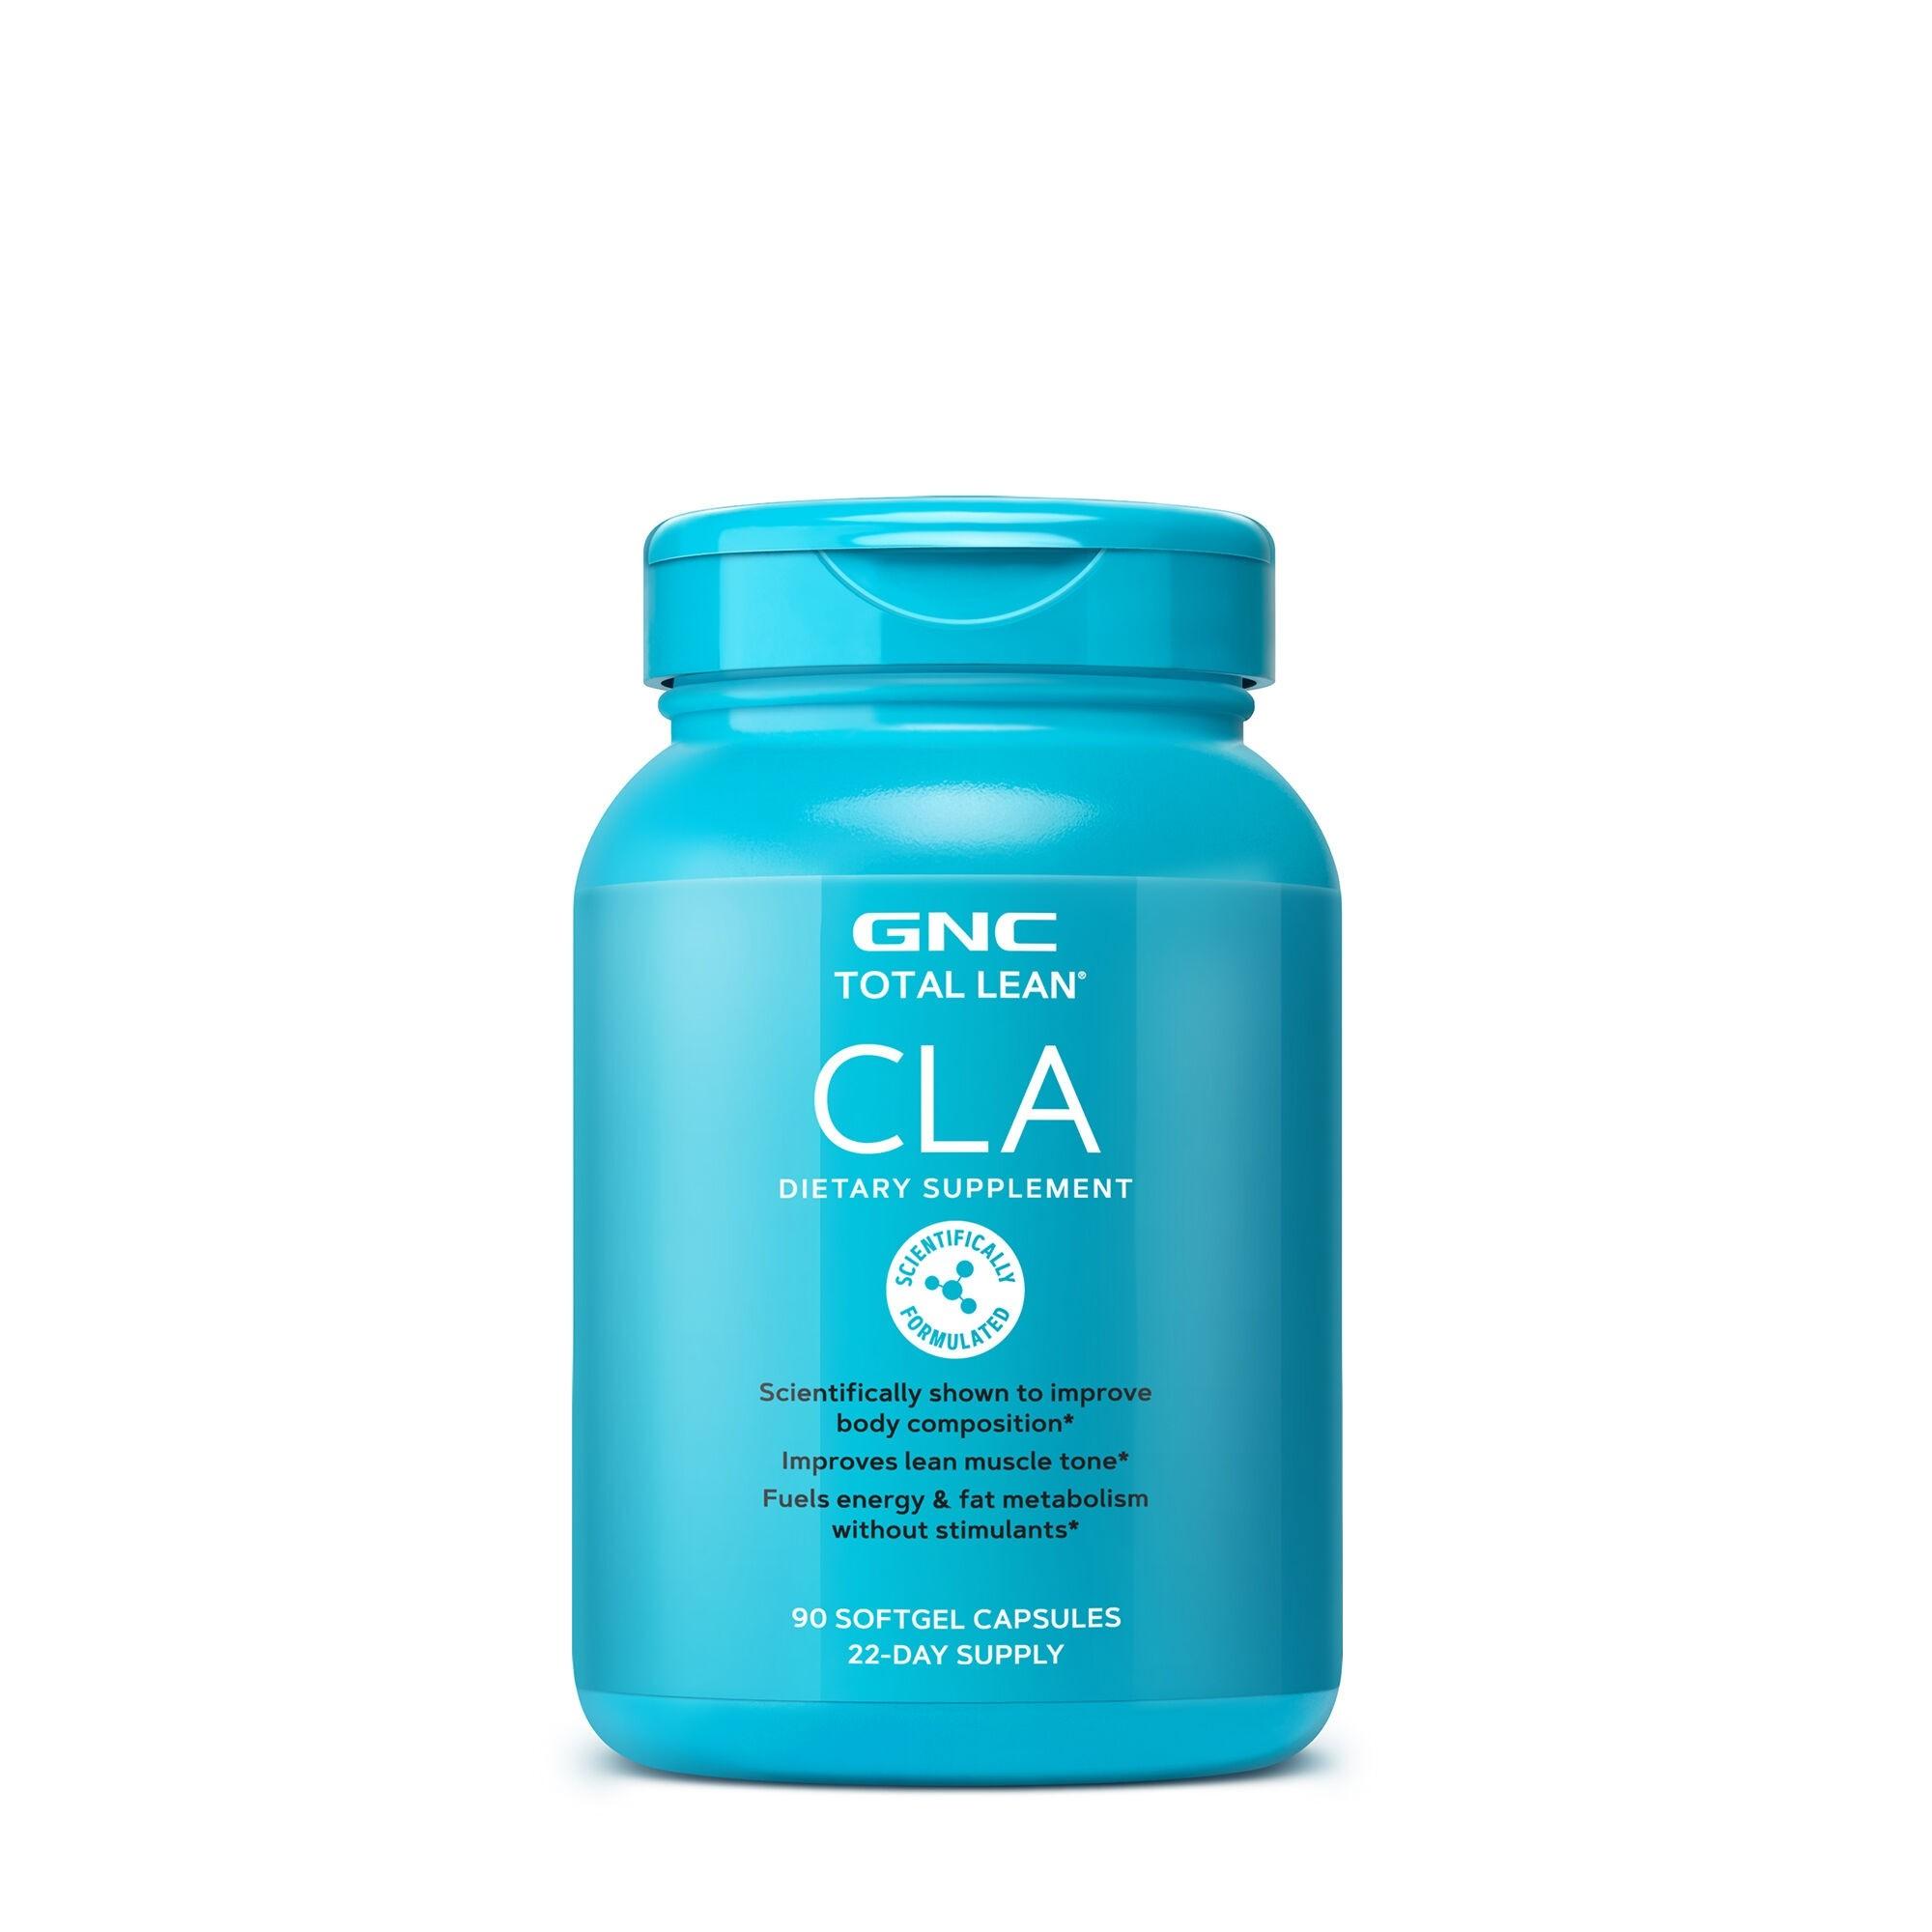 GNC Total Lean® CLA, Acid Linoleic Conjugat, 90 cps